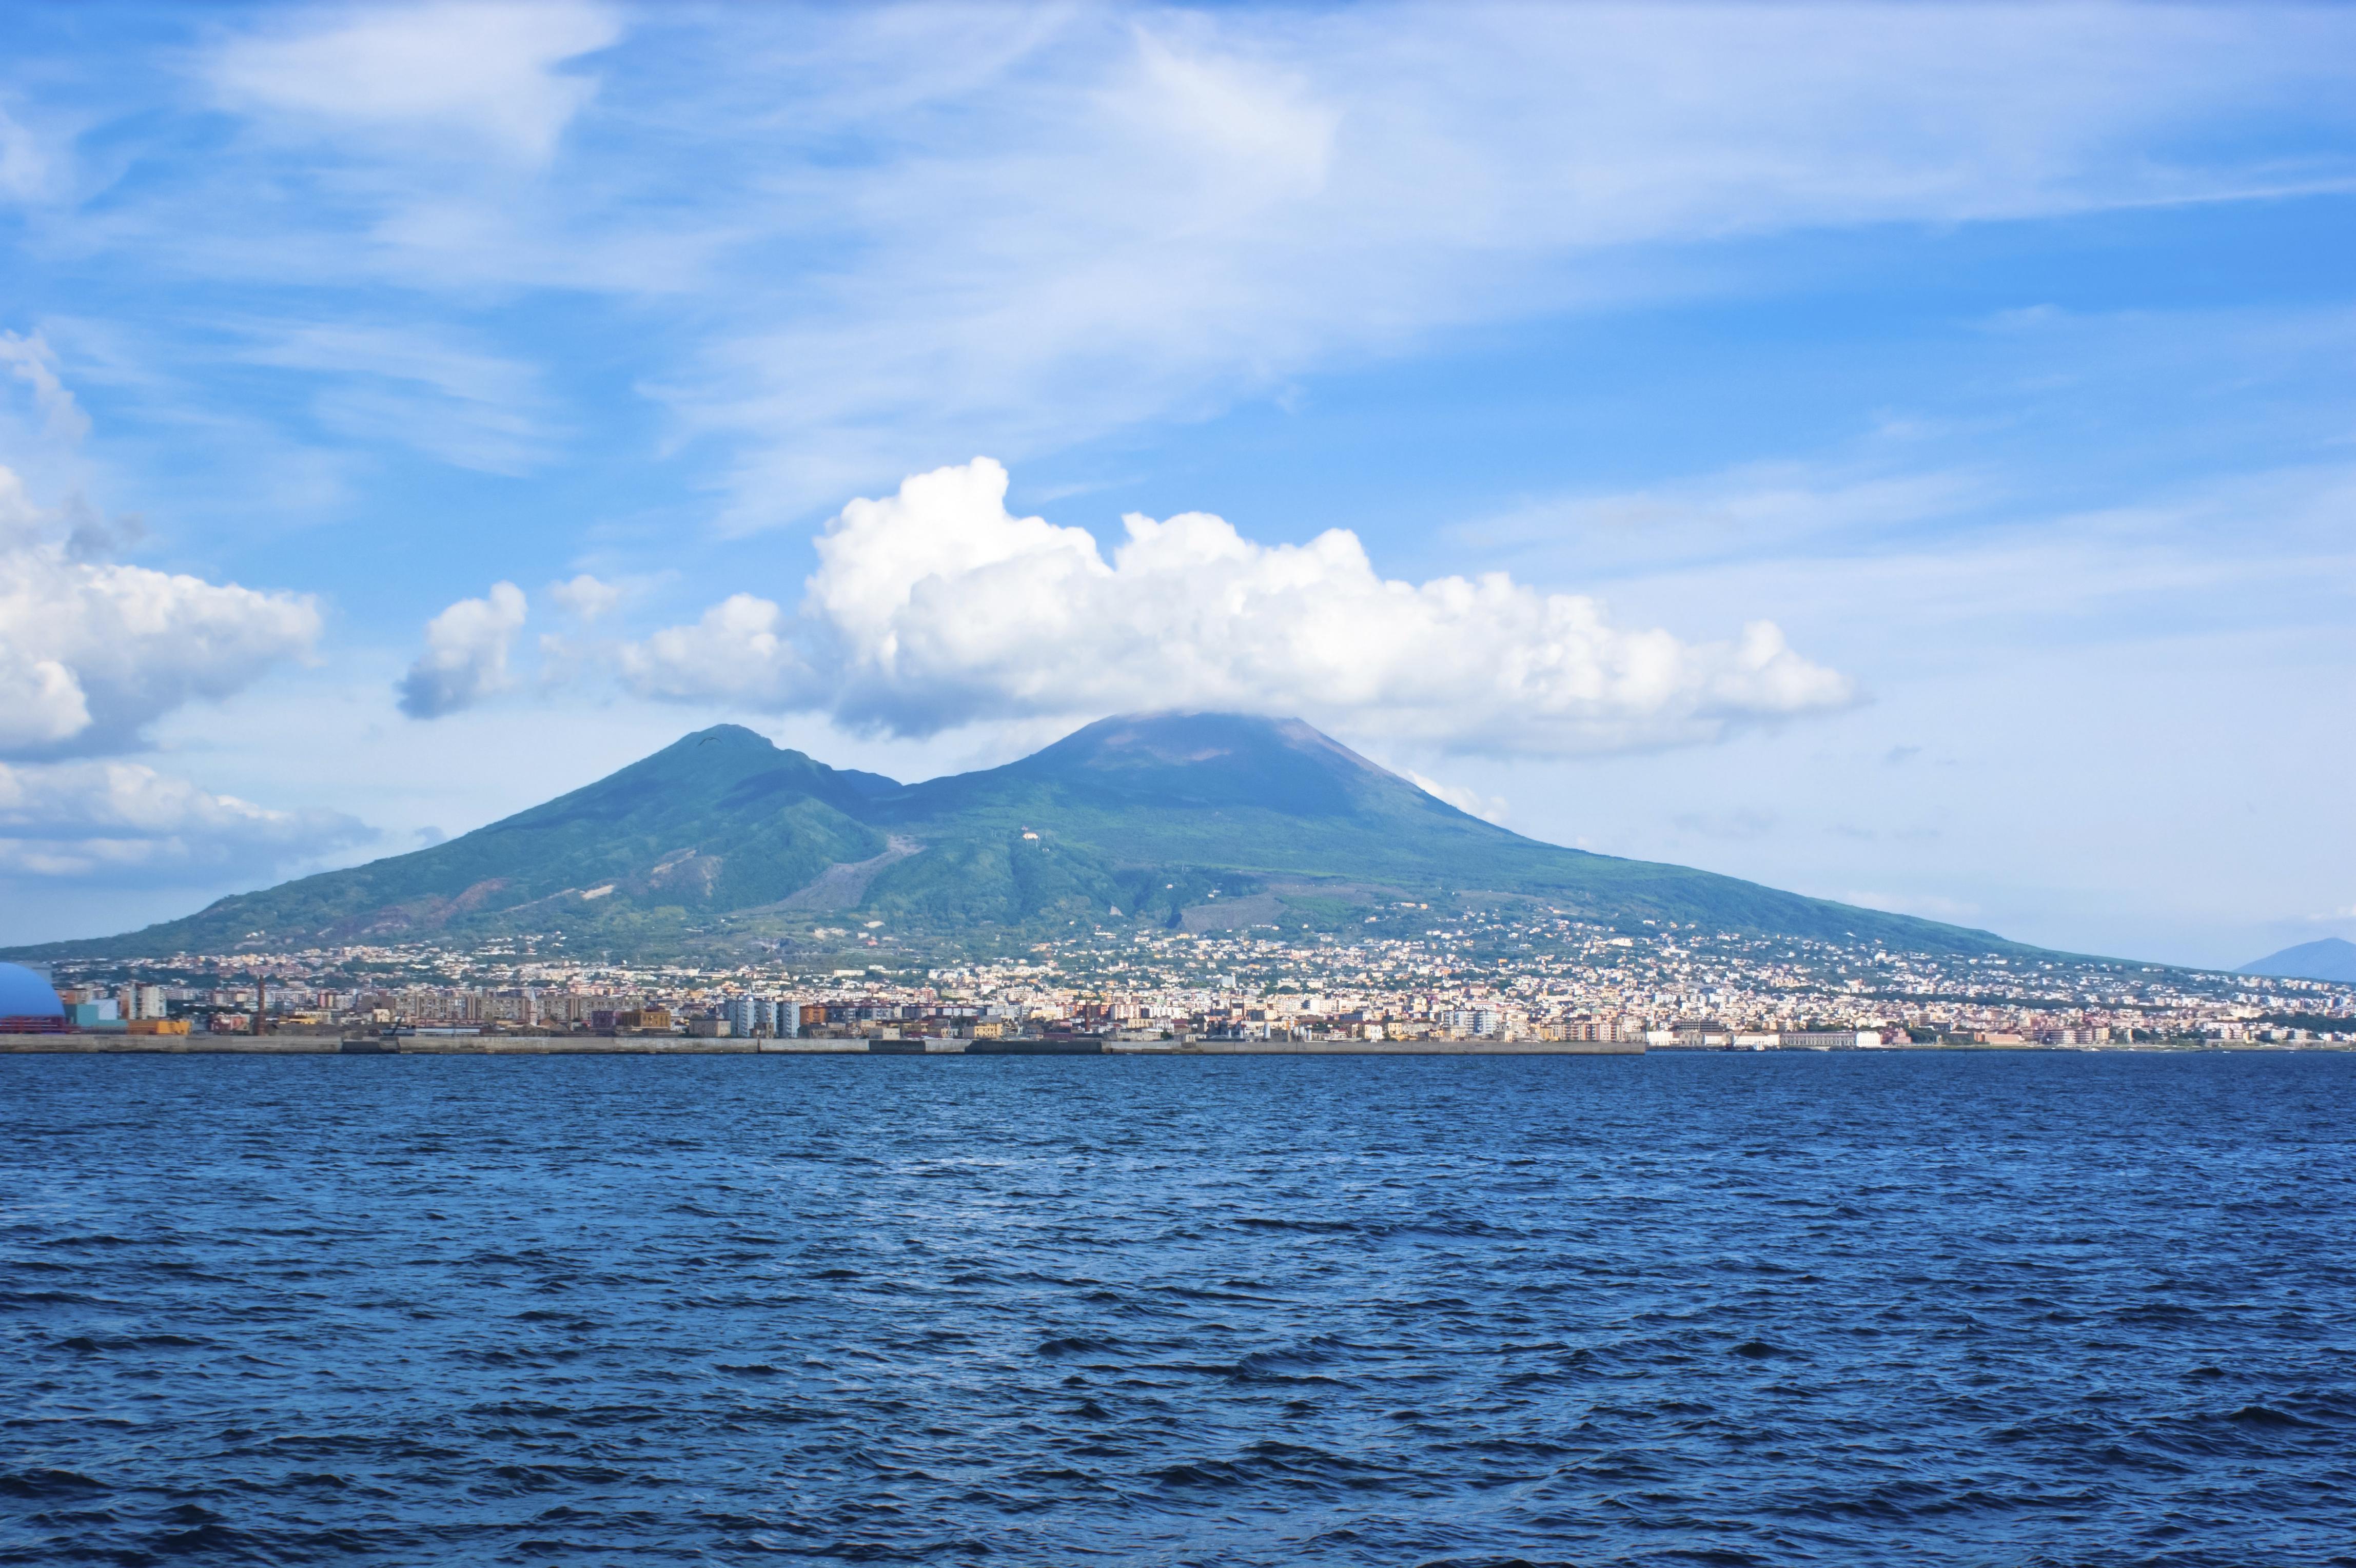 OUR AREA - Mount Vesuvius